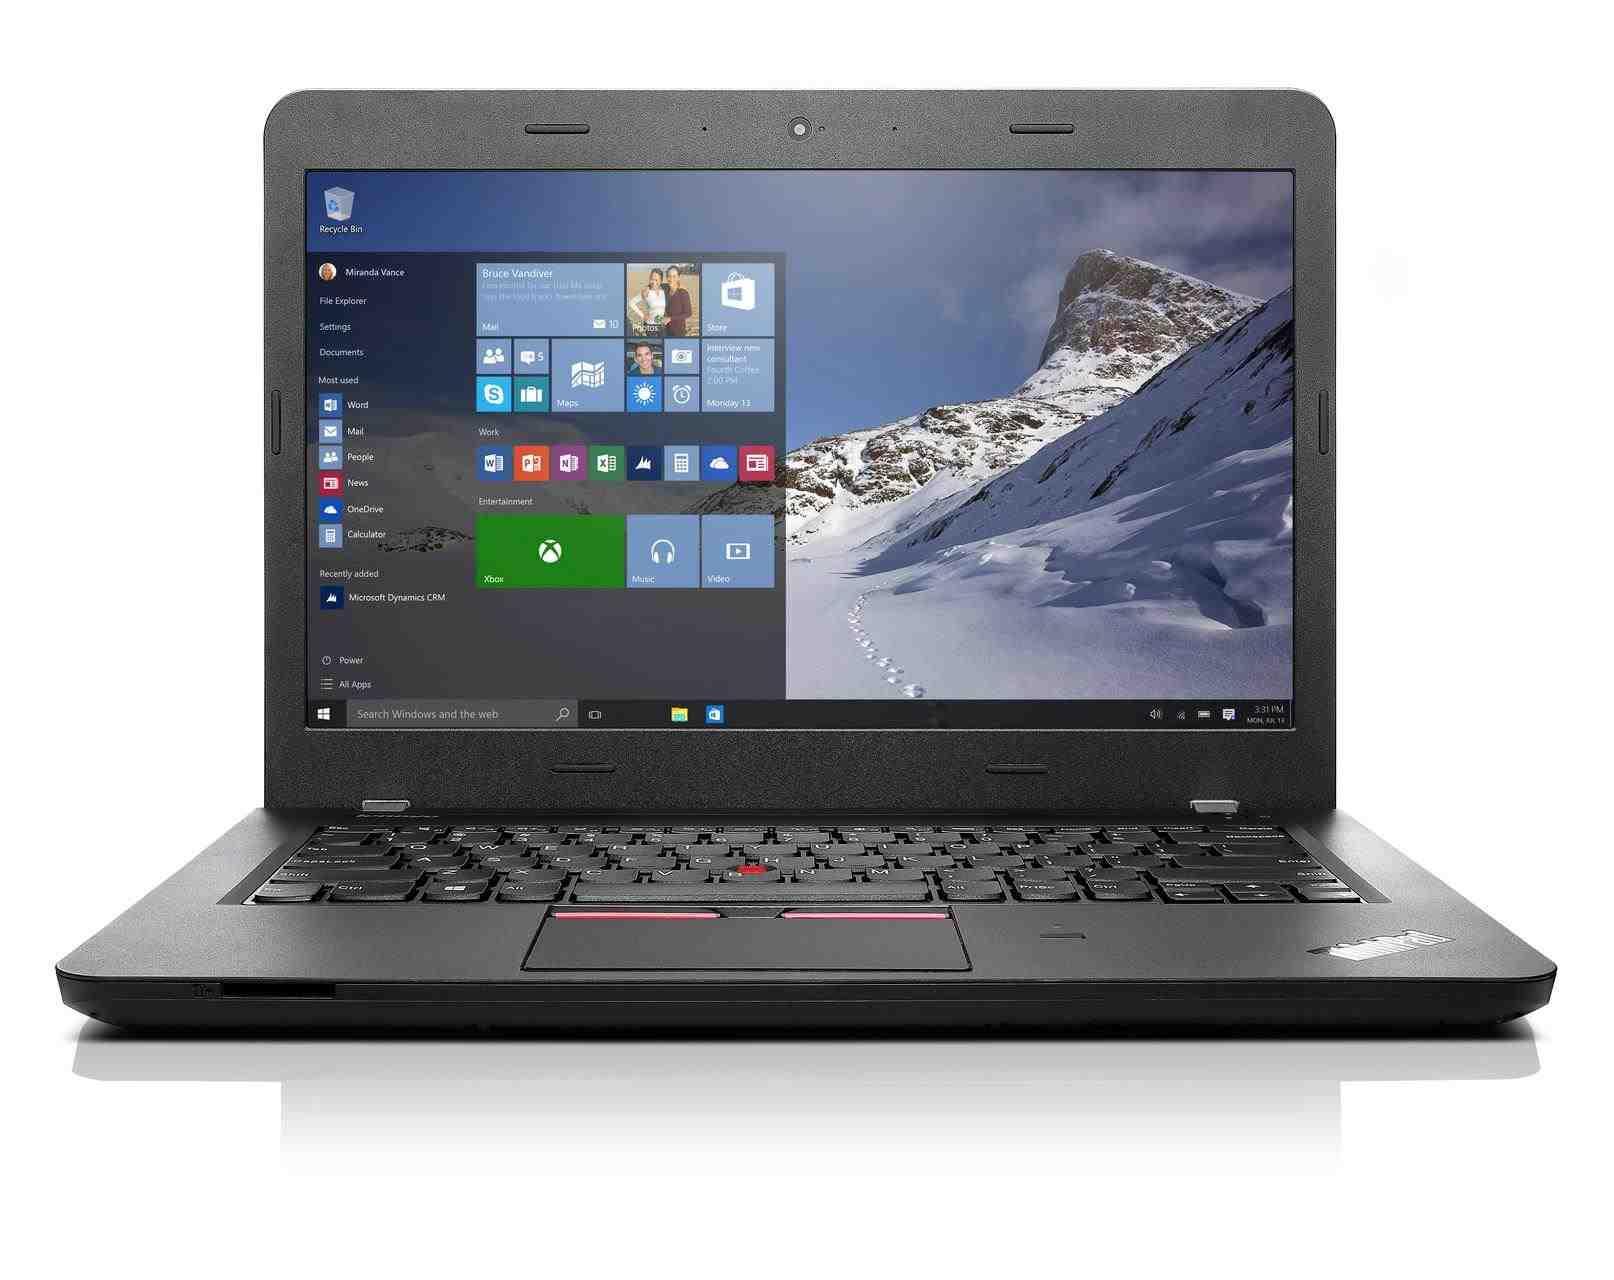 Lenovo ThinkPad E460 20ET004JXS